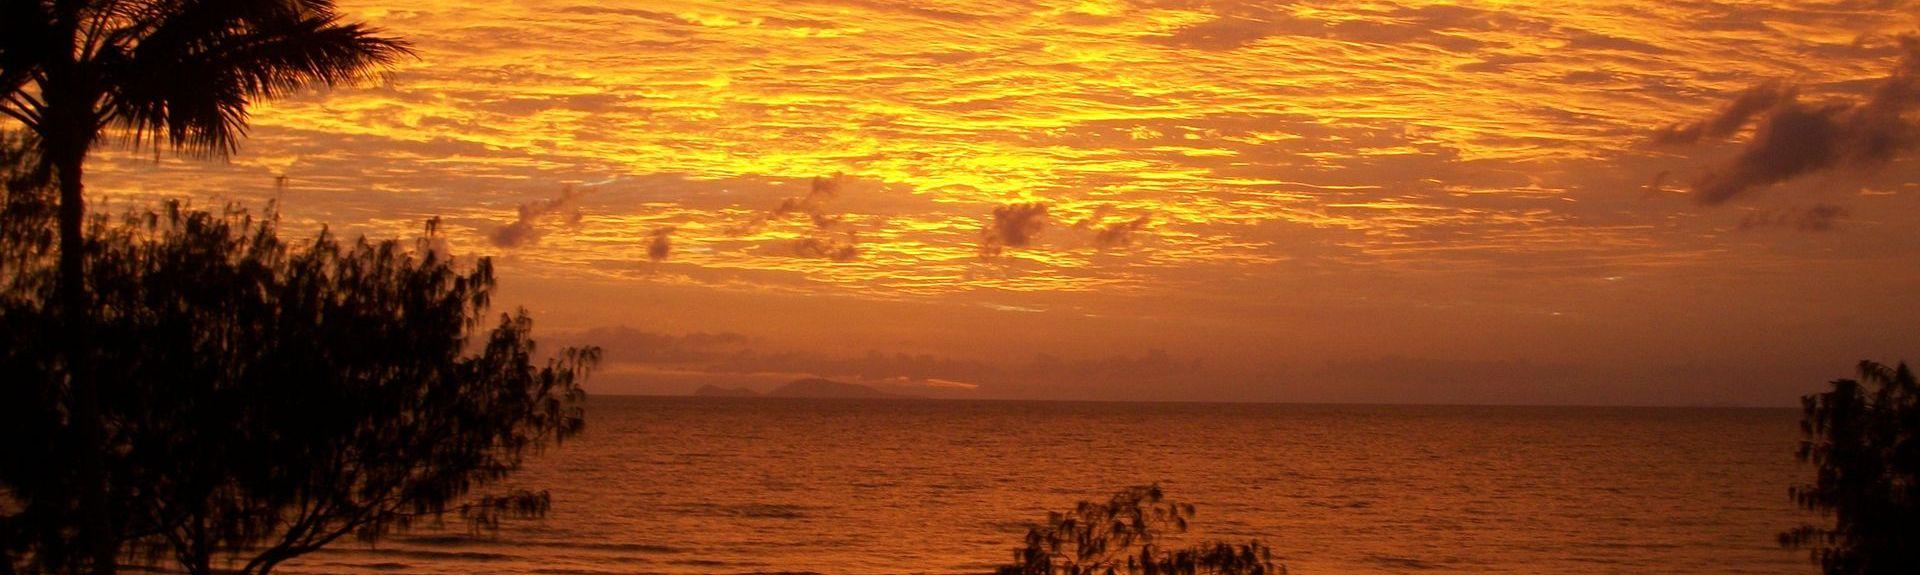 Hay Point QLD, Australia